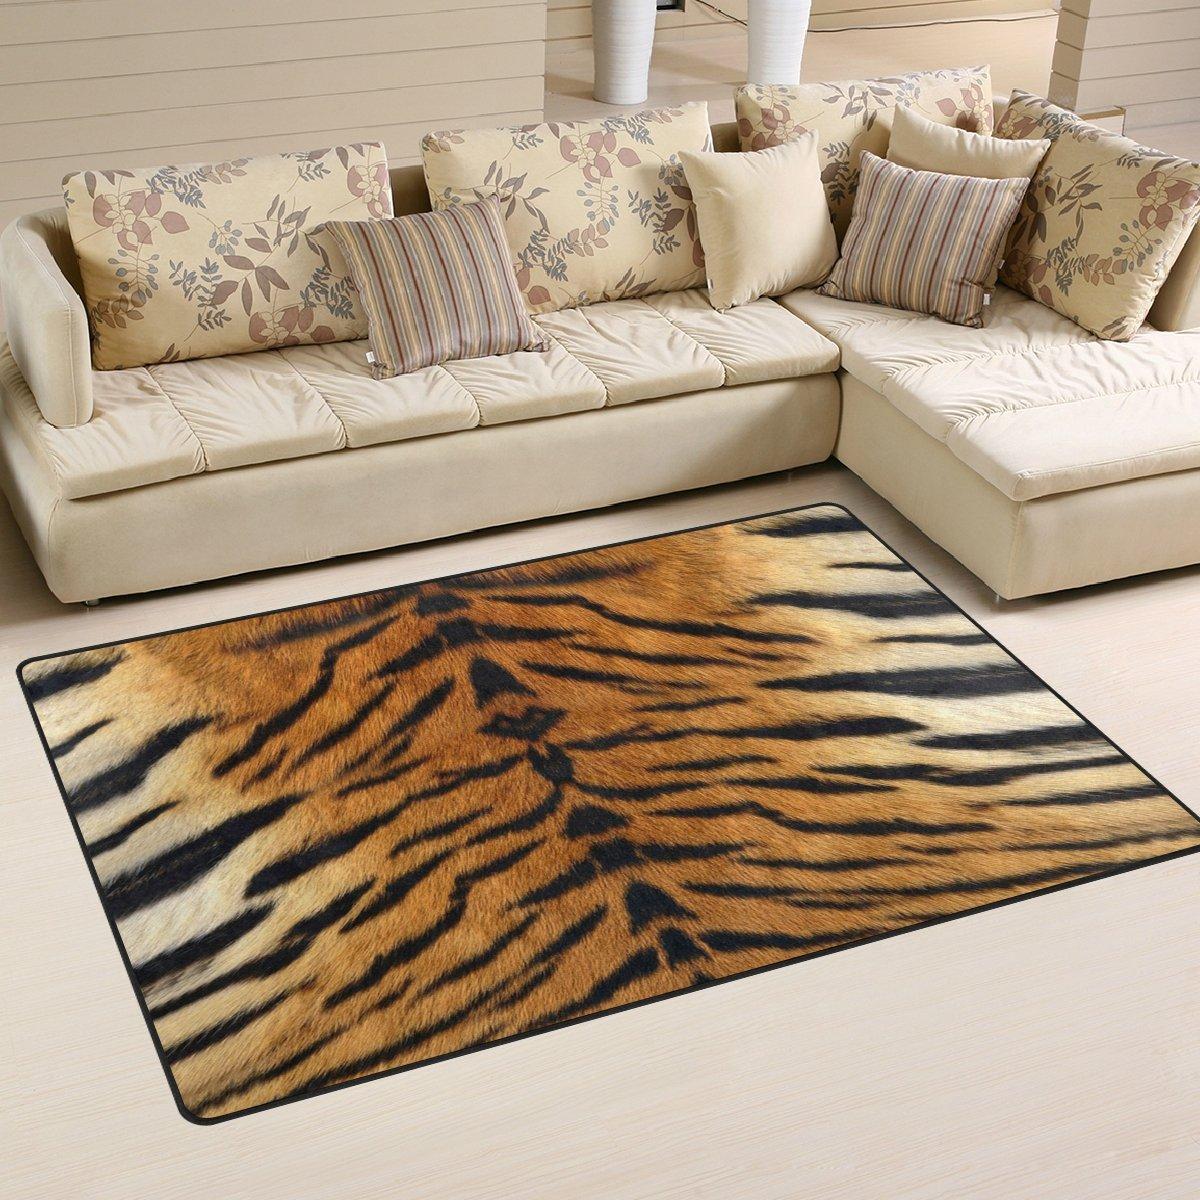 Naanle Animal Print Area Rug 3'x5', Tiger Print Polyester Area Rug Mat Living Dining Dorm Room Bedroom Home Decorative